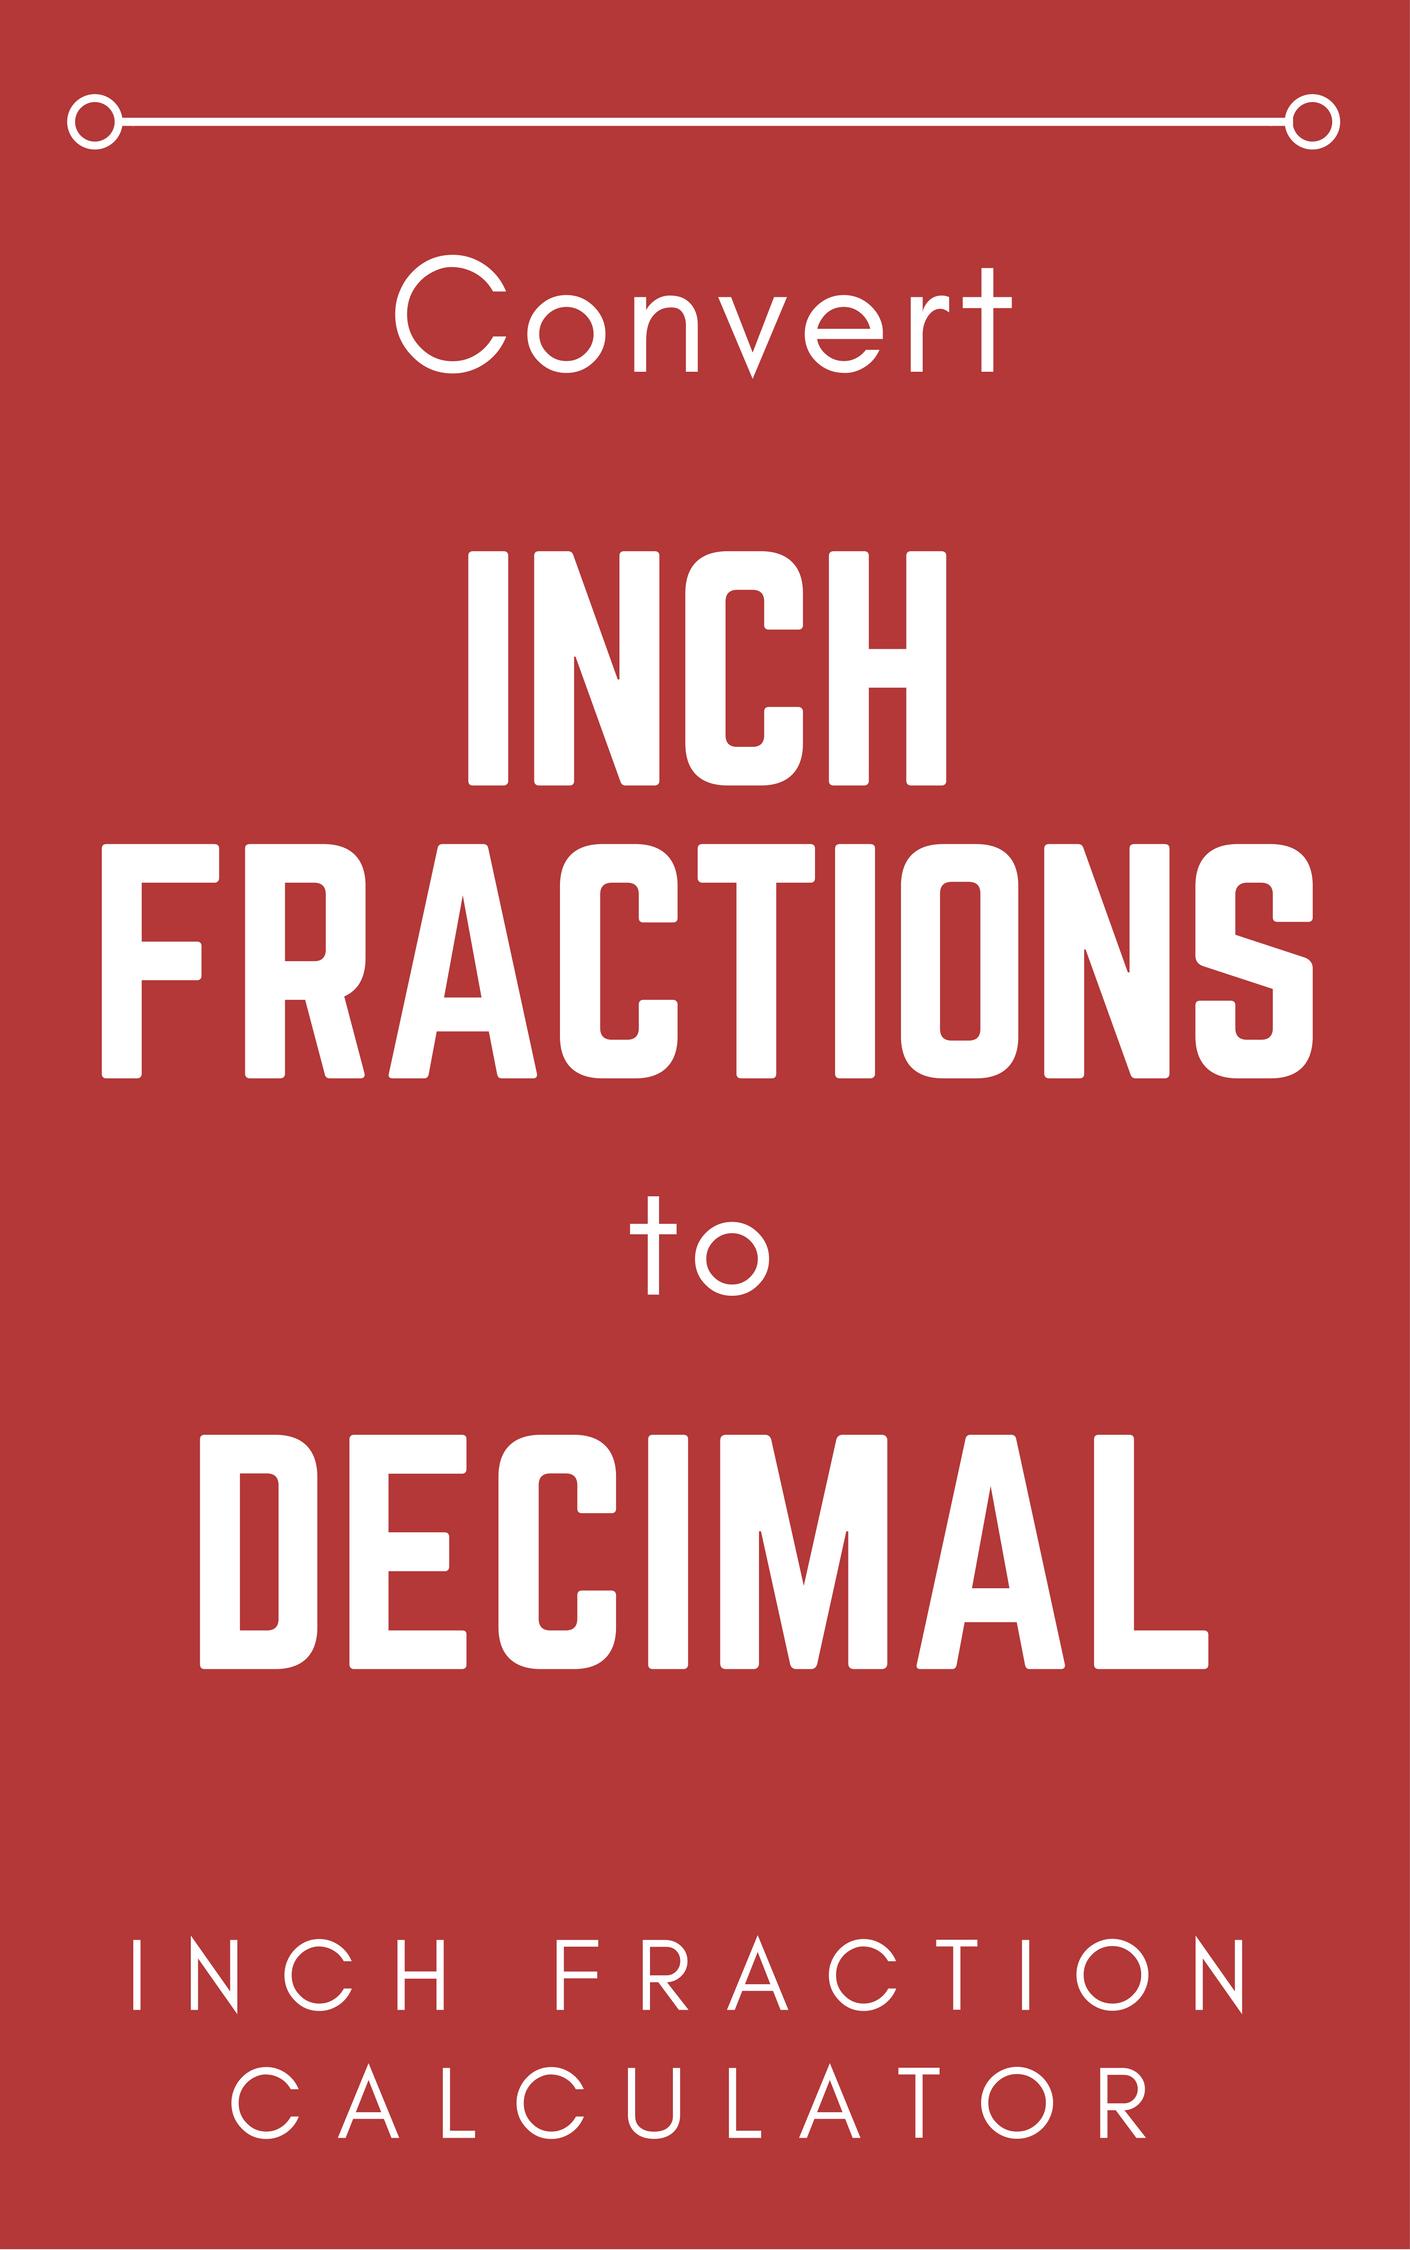 Inch Fraction Calculator